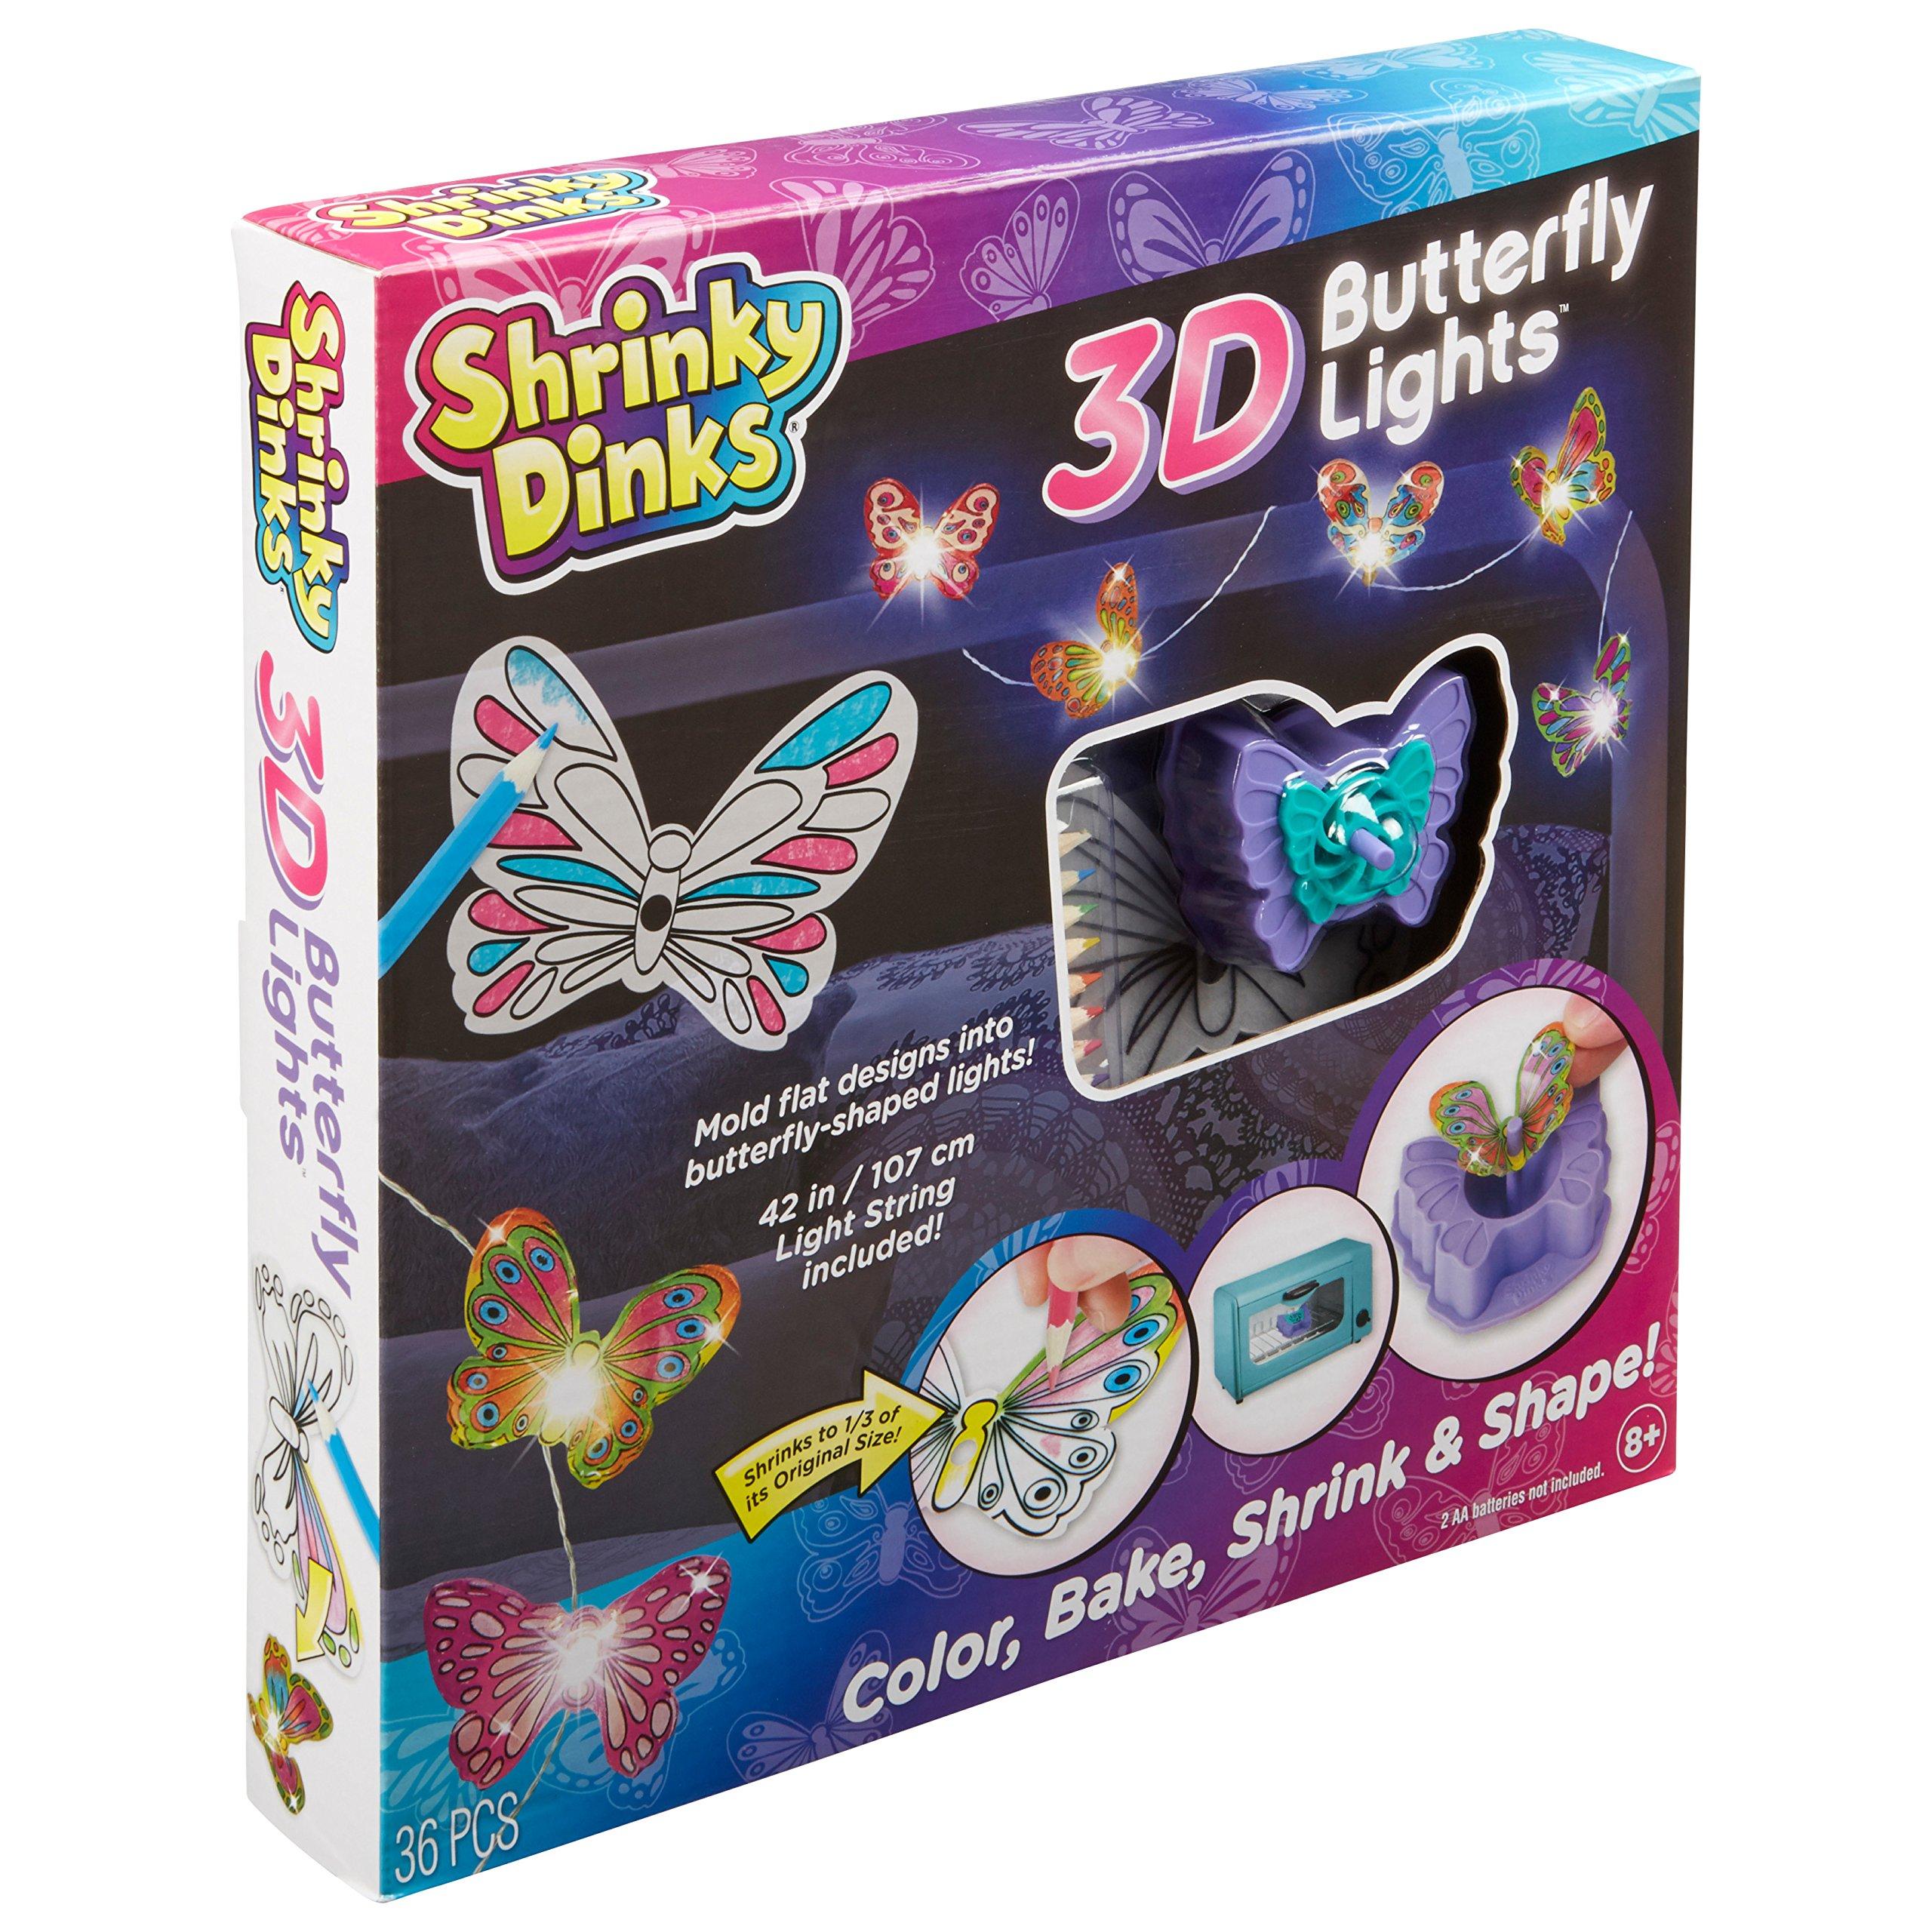 Shrinky Dinks 3D Butterfly Lights Kids Art and Craft Activity